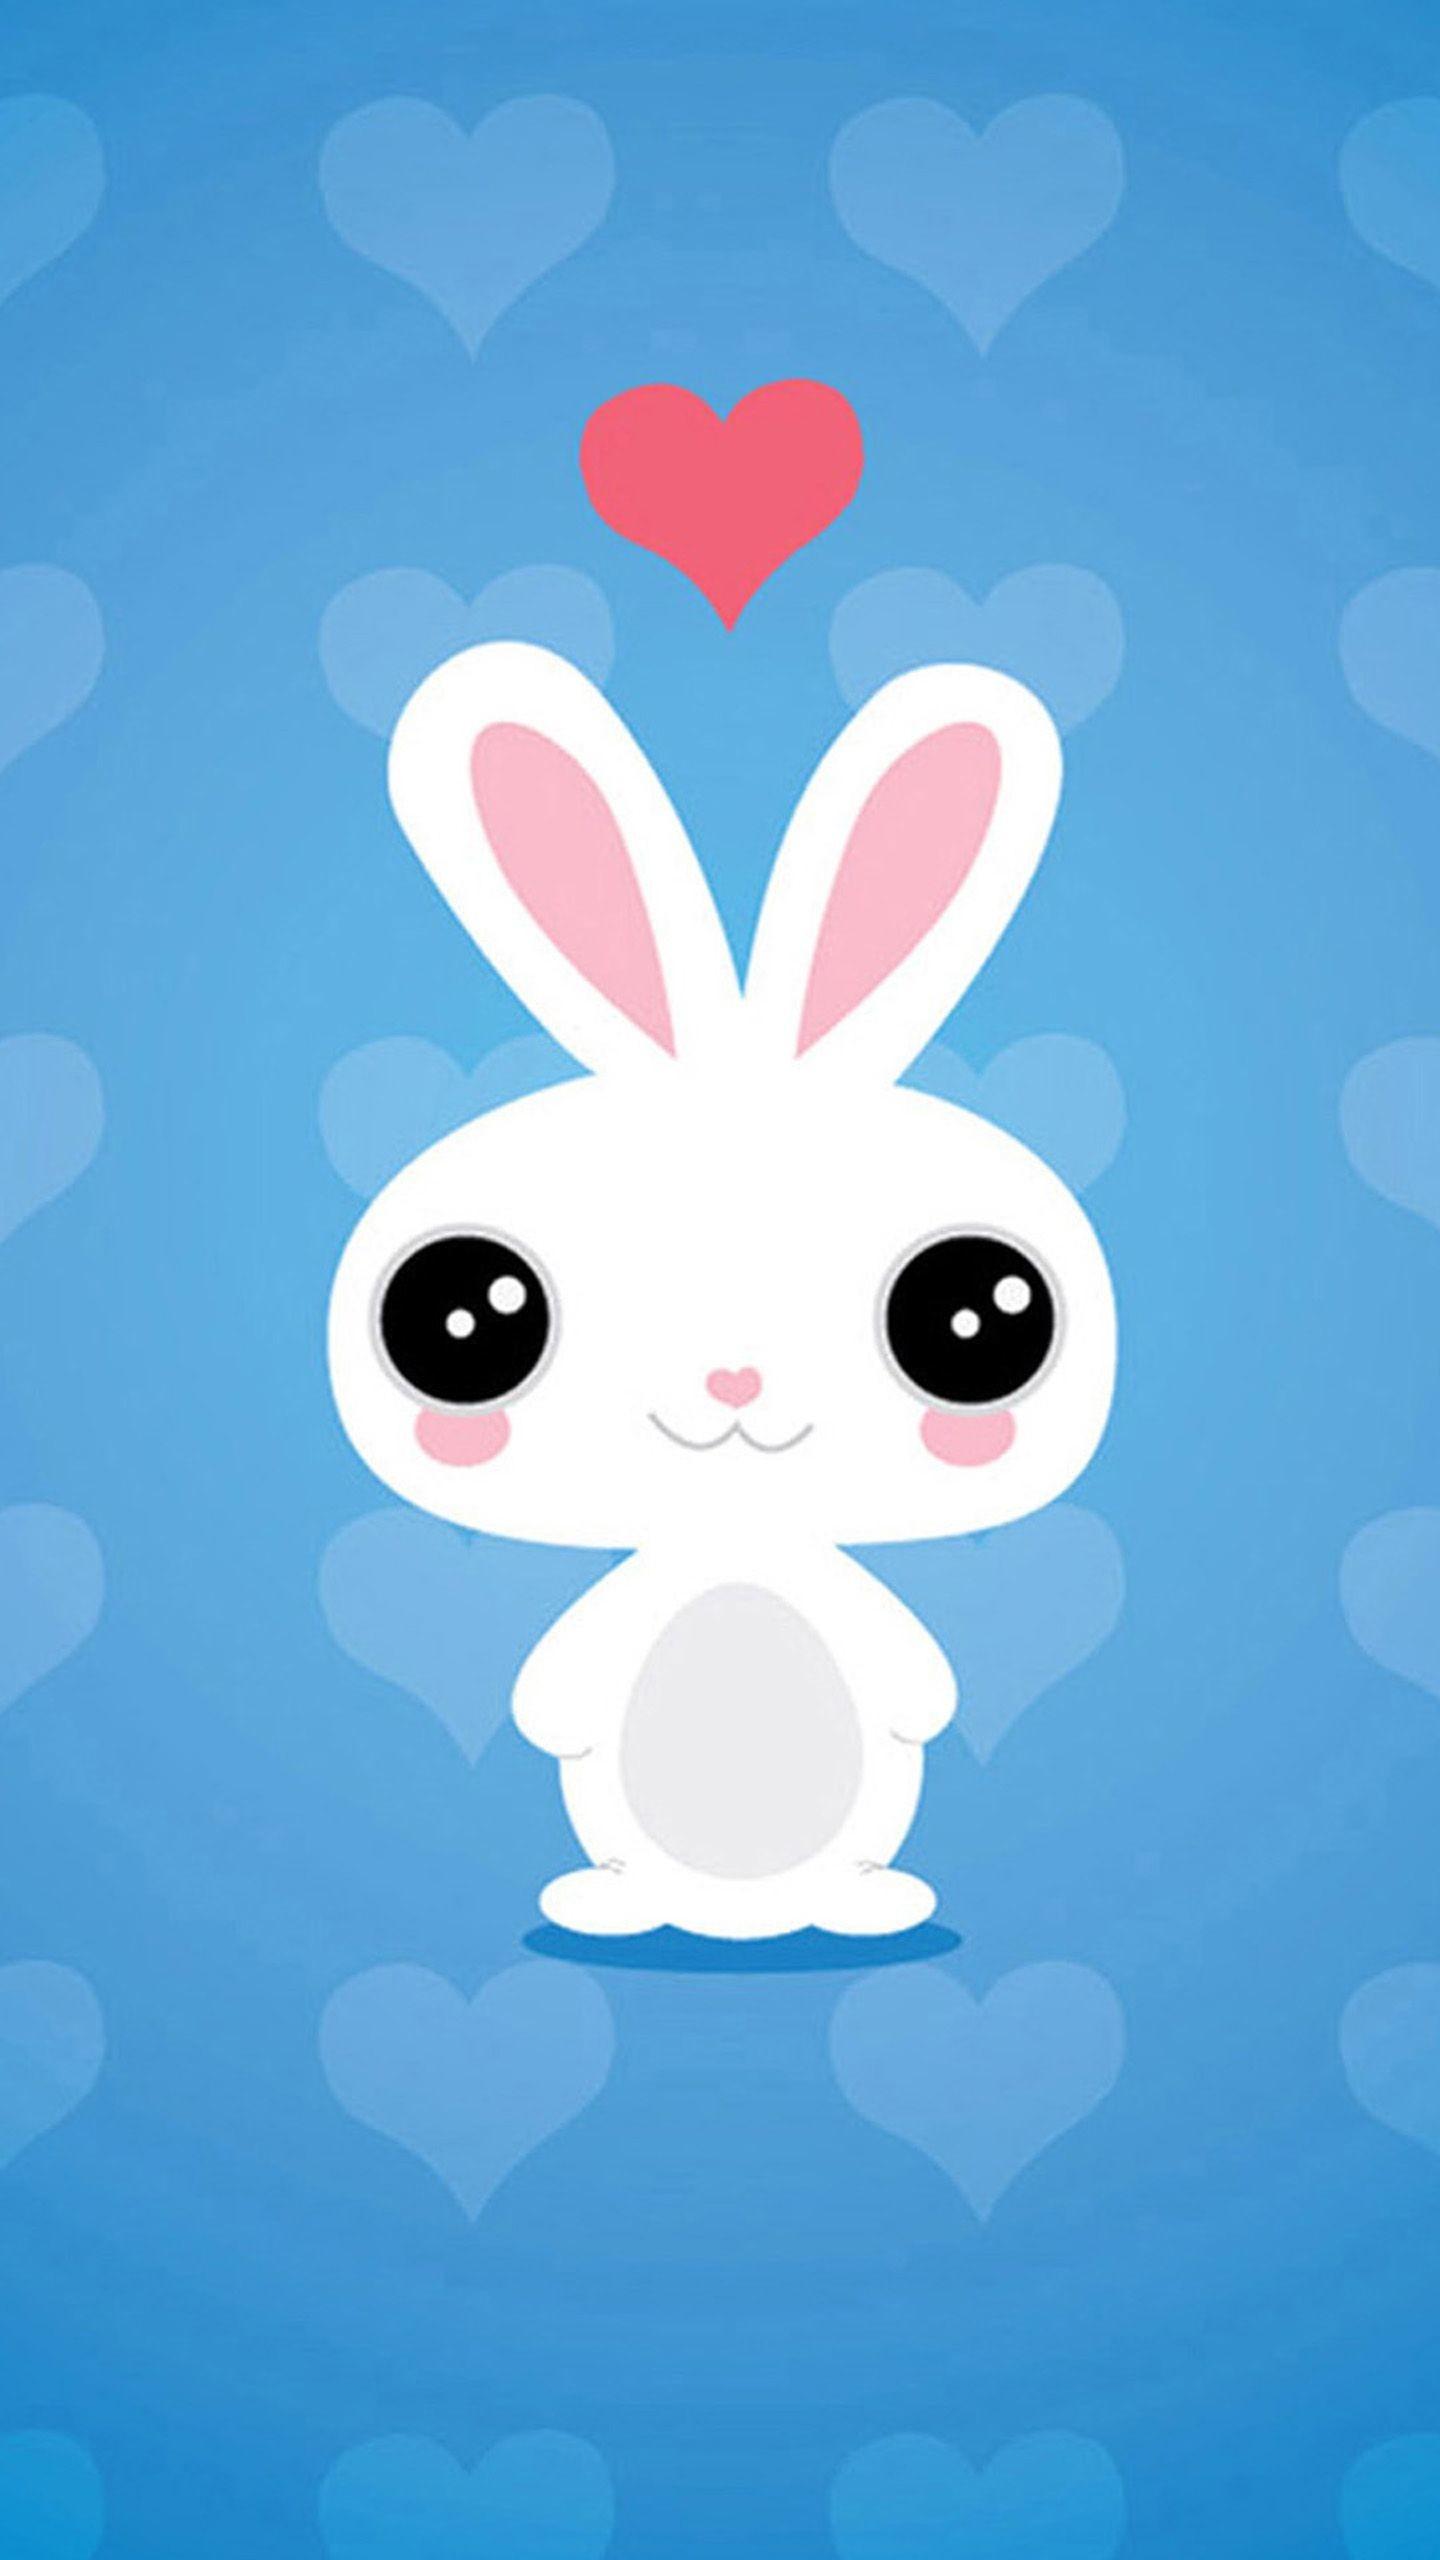 Cute Baby Bunnies Wallpaper 69 Images